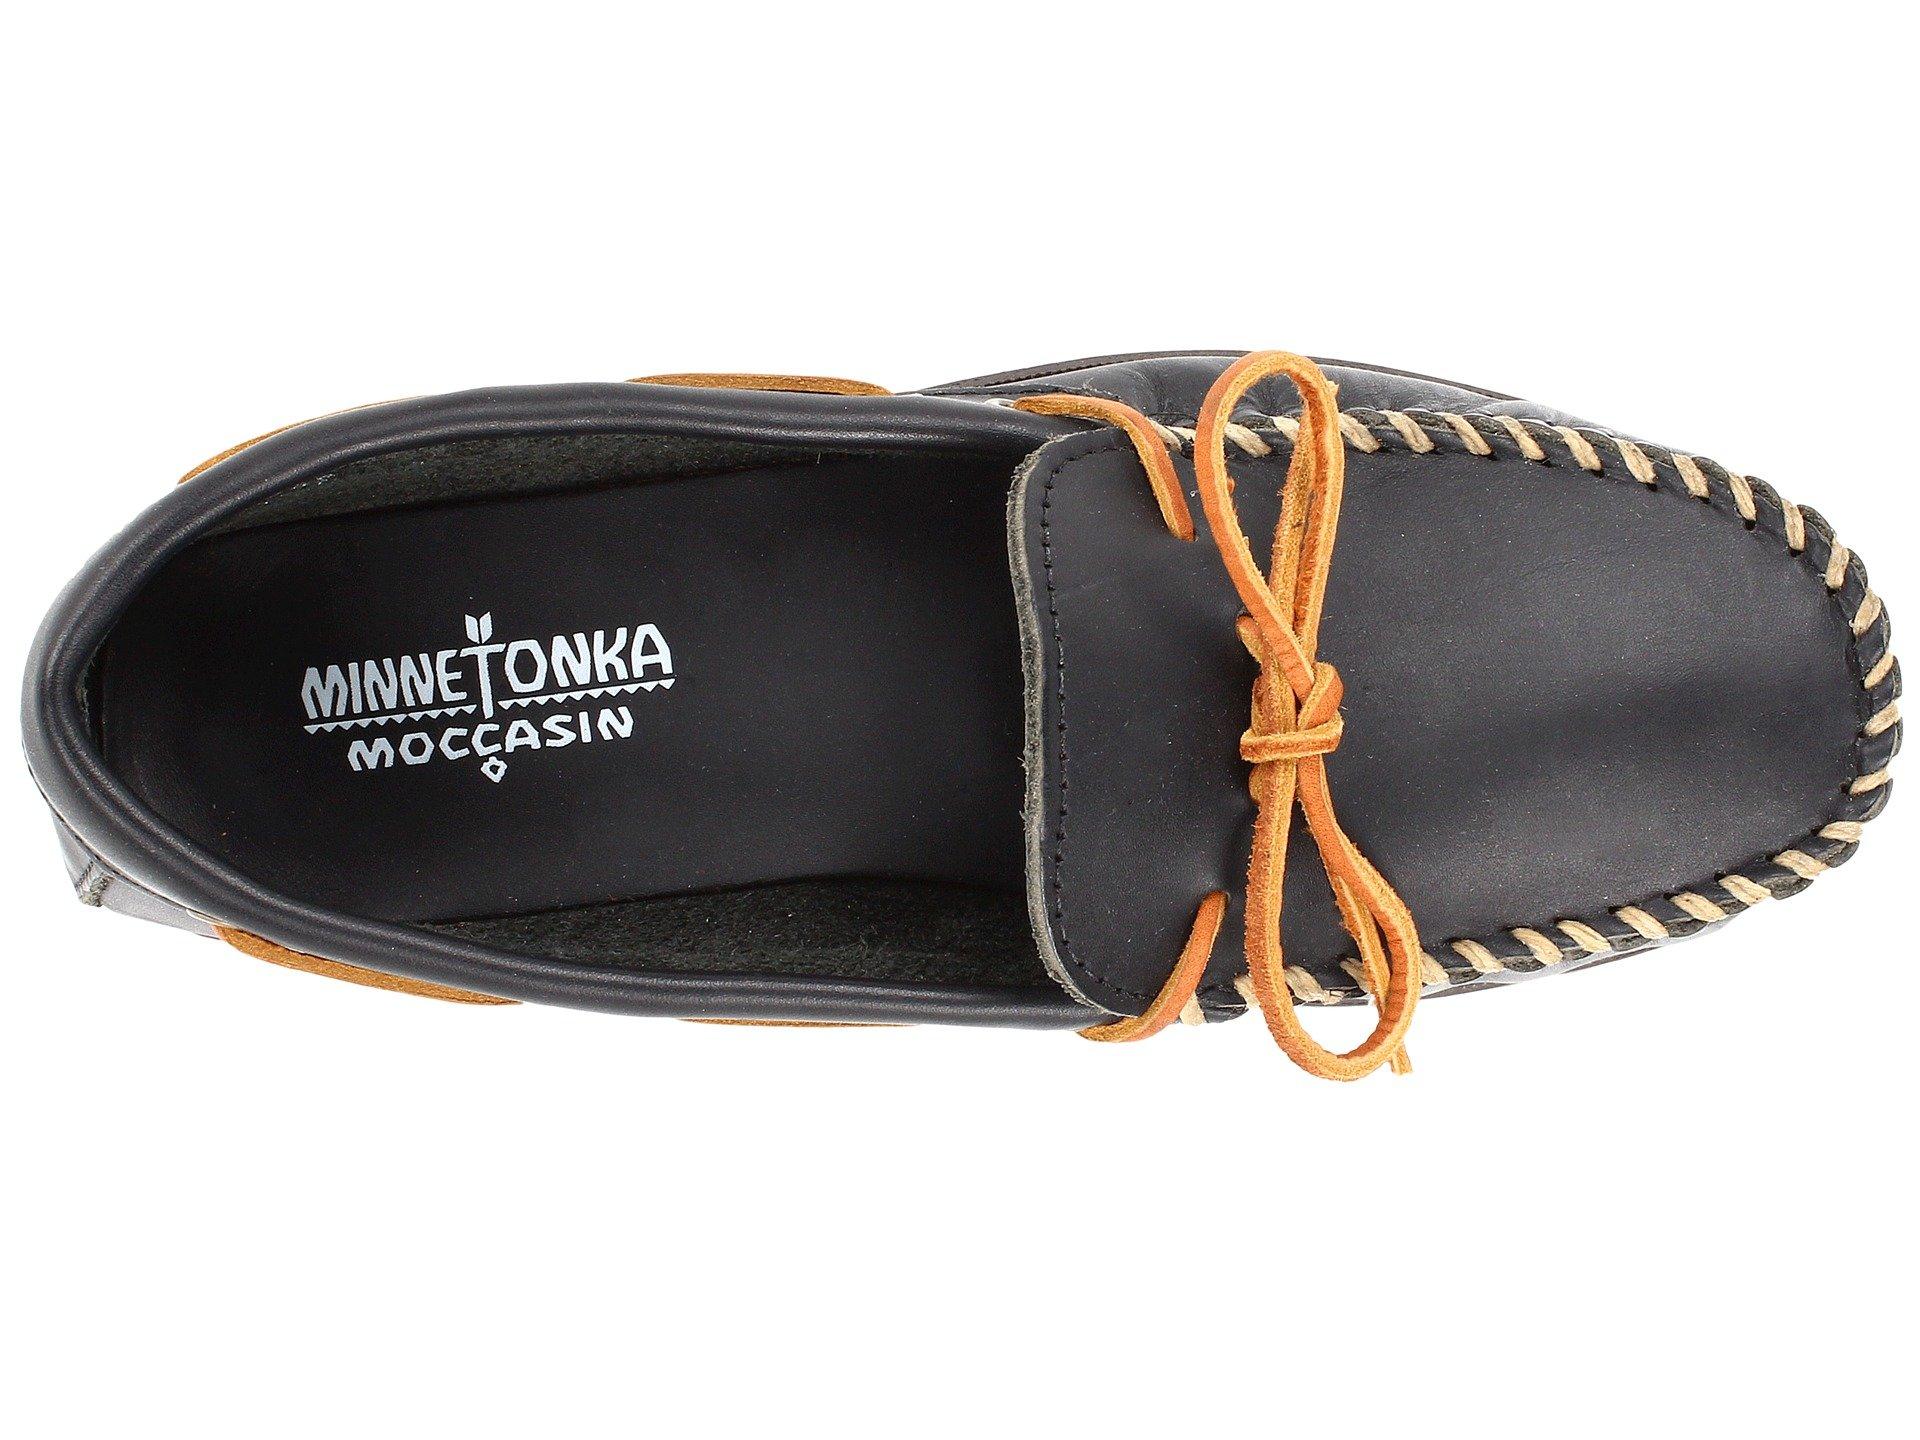 Mocc Minnetonka Smooth Leather Black Camp Twan5xqwF